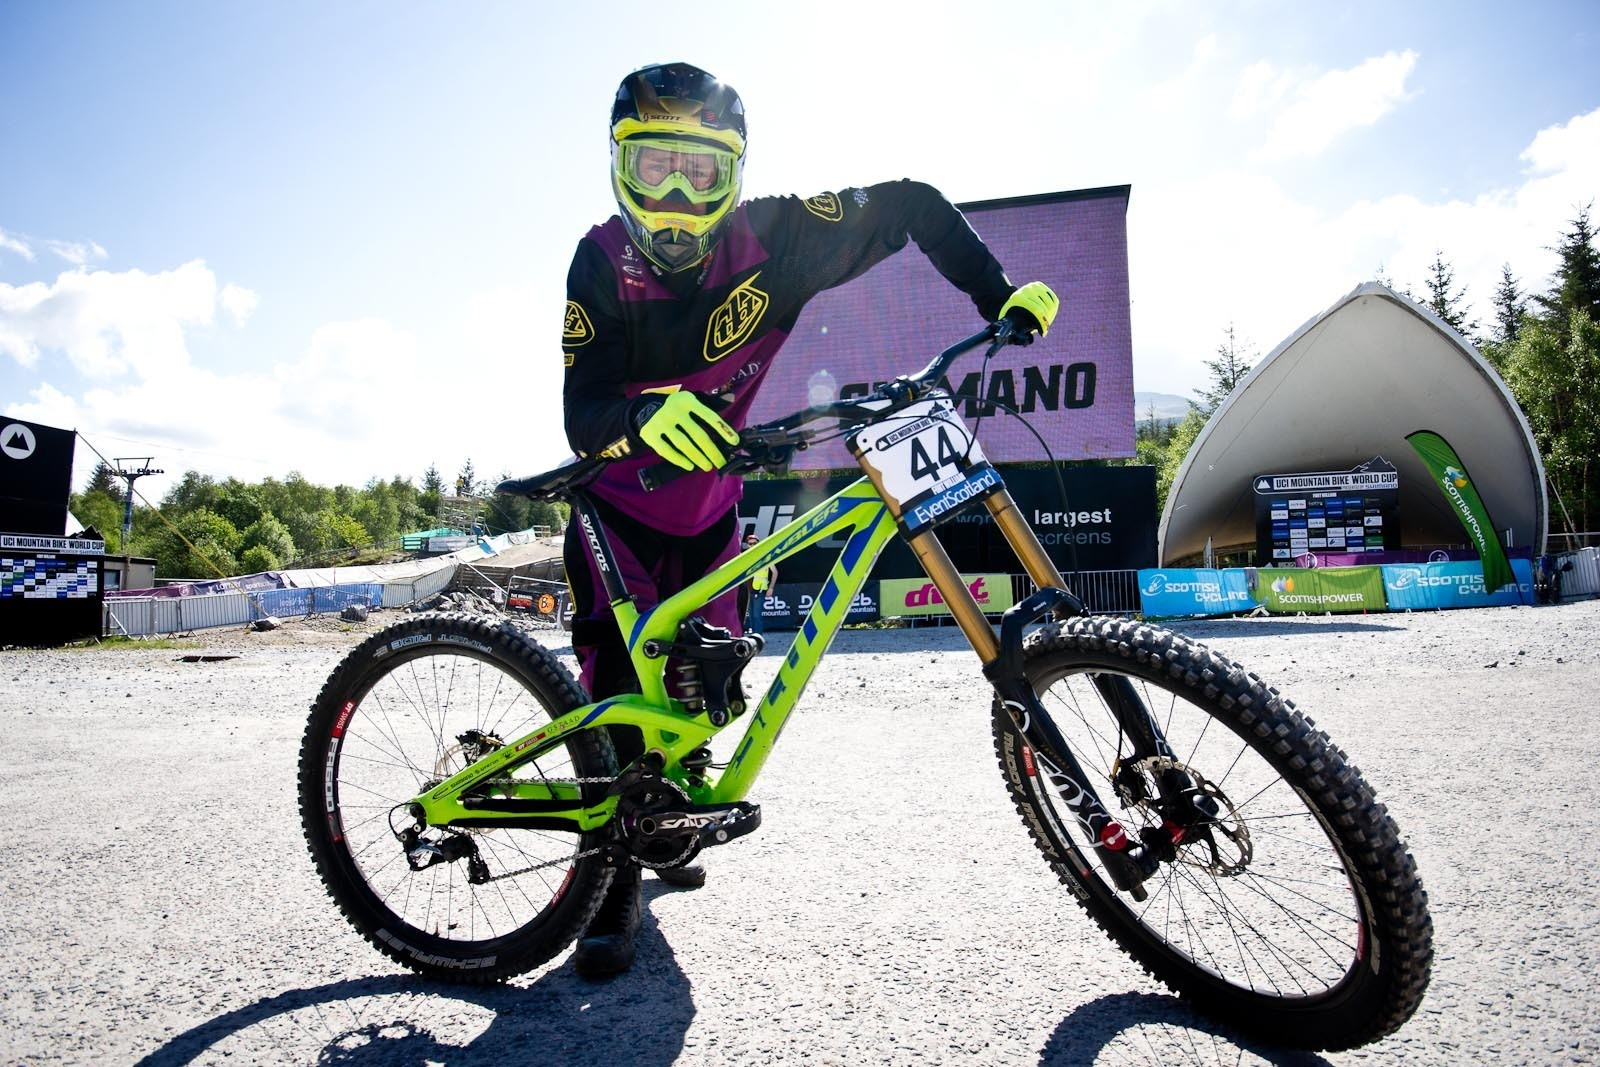 Brendan Fairclough's Scott Gambler - 24 Pro DH BIkes from Fort William World Cup - Mountain Biking Pictures - Vital MTB